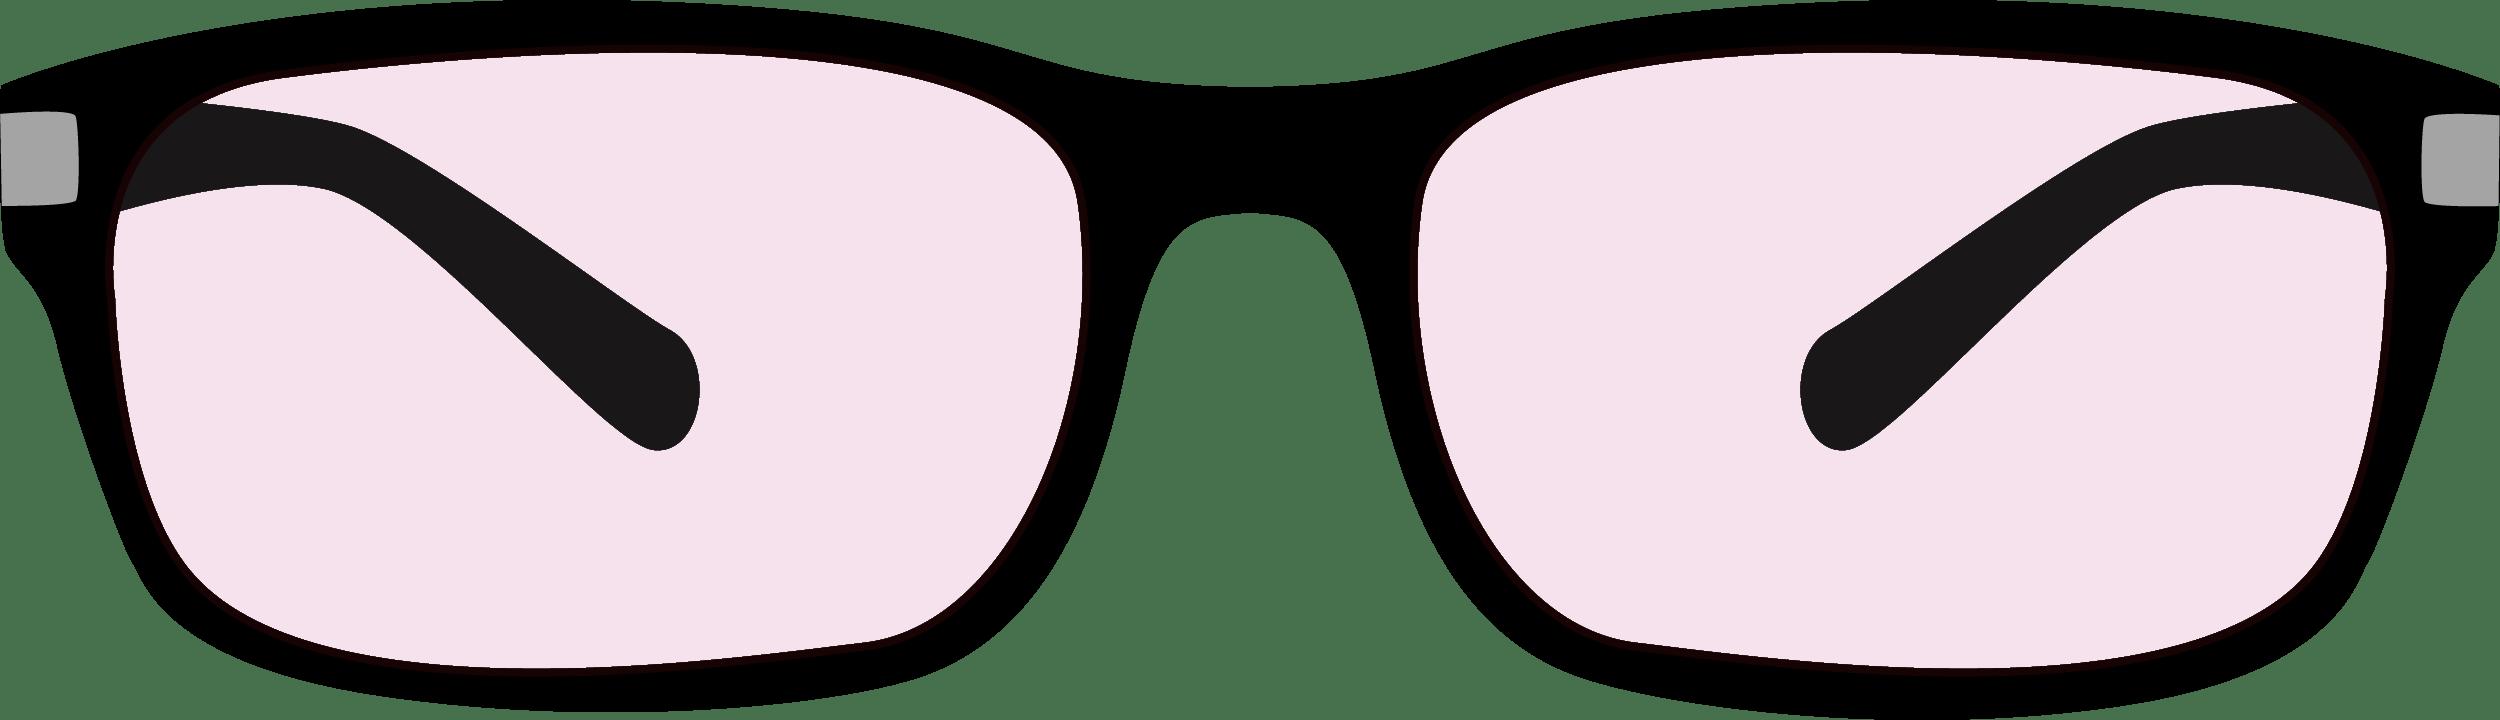 Simple Glasses Clip-art PNG